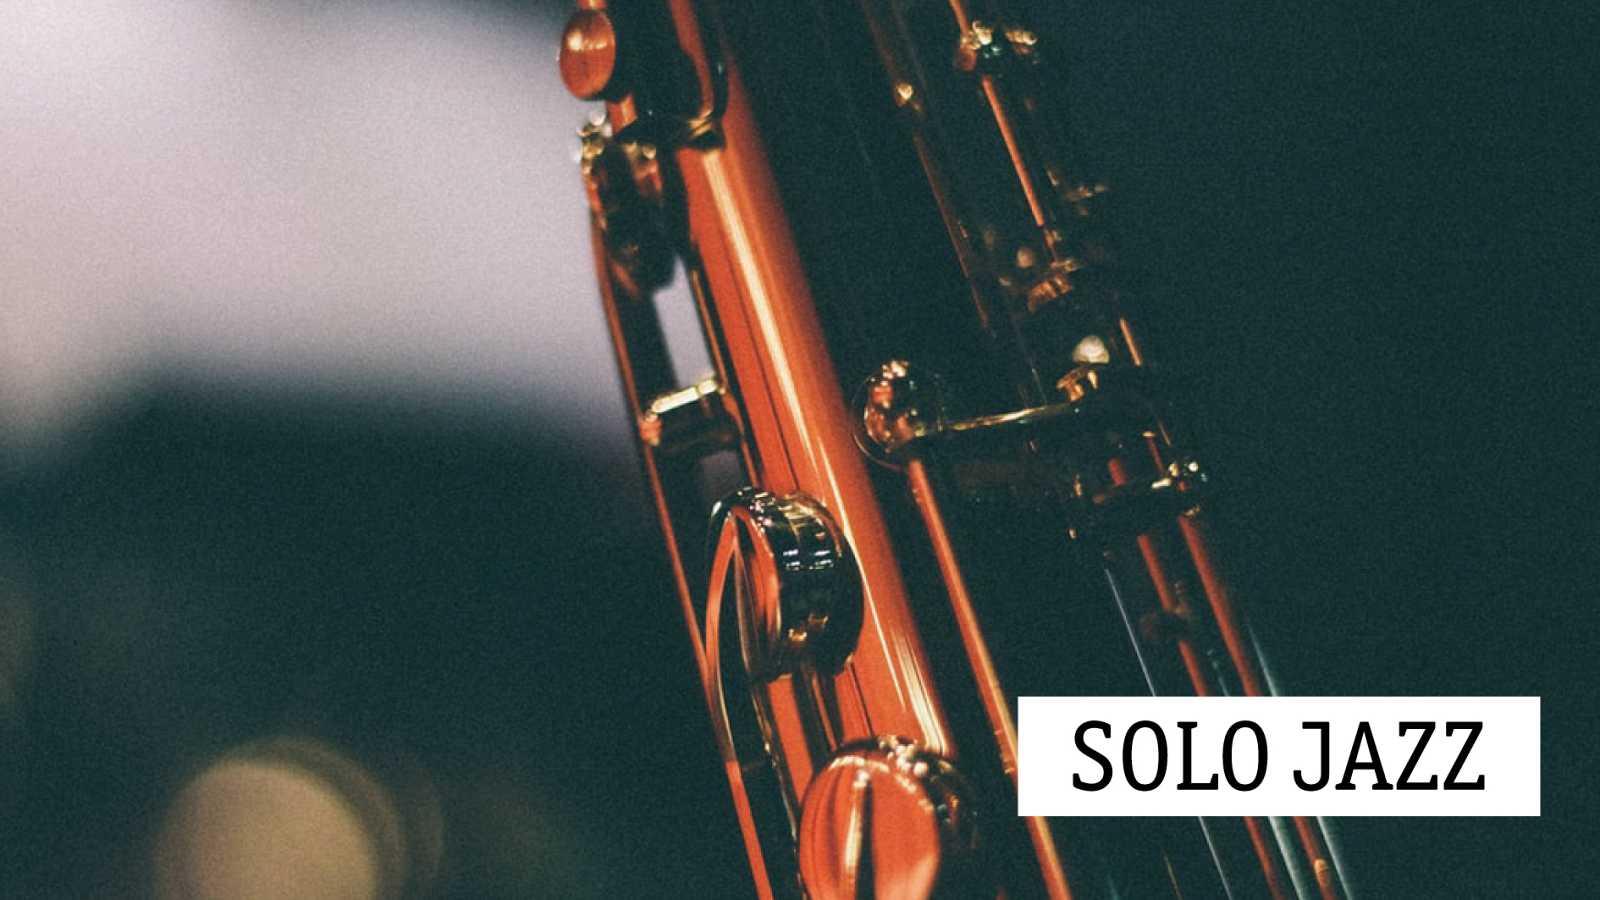 Solo jazz - Joachim Kühn, la medida exacta del talento - 27/11/20 - escuchar ahora